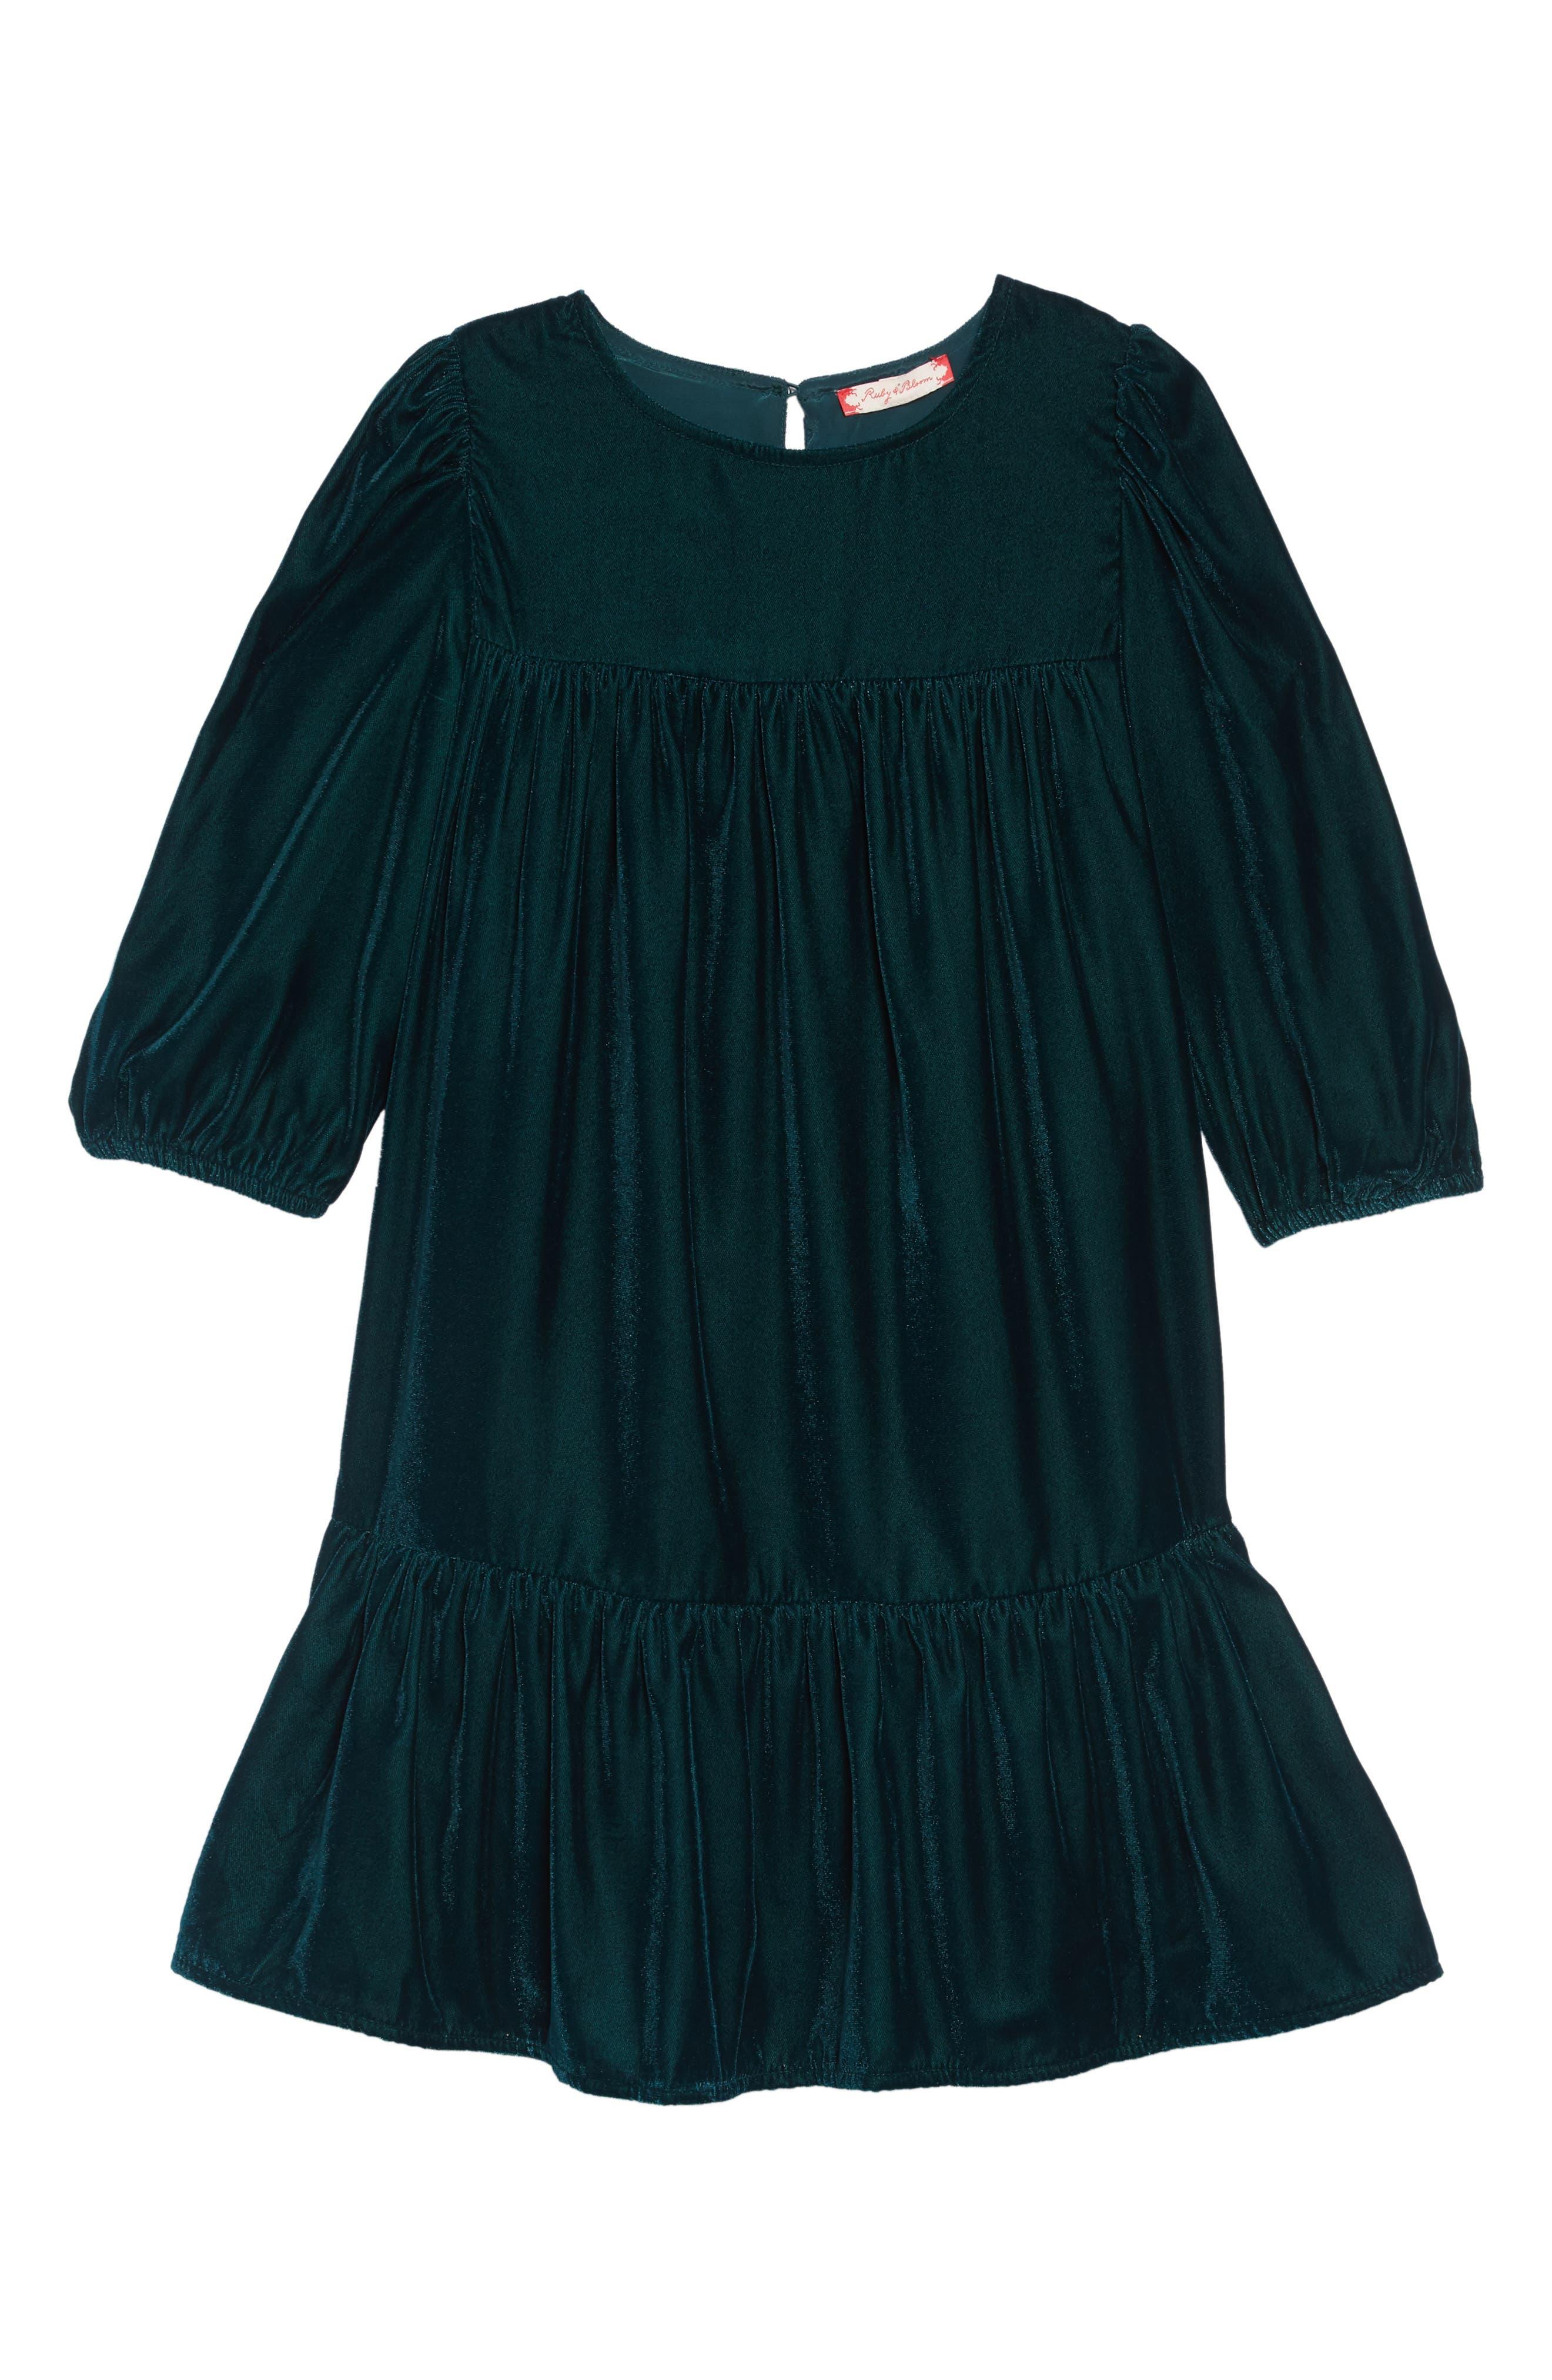 Velvet Party Dress,                             Main thumbnail 1, color,                             301